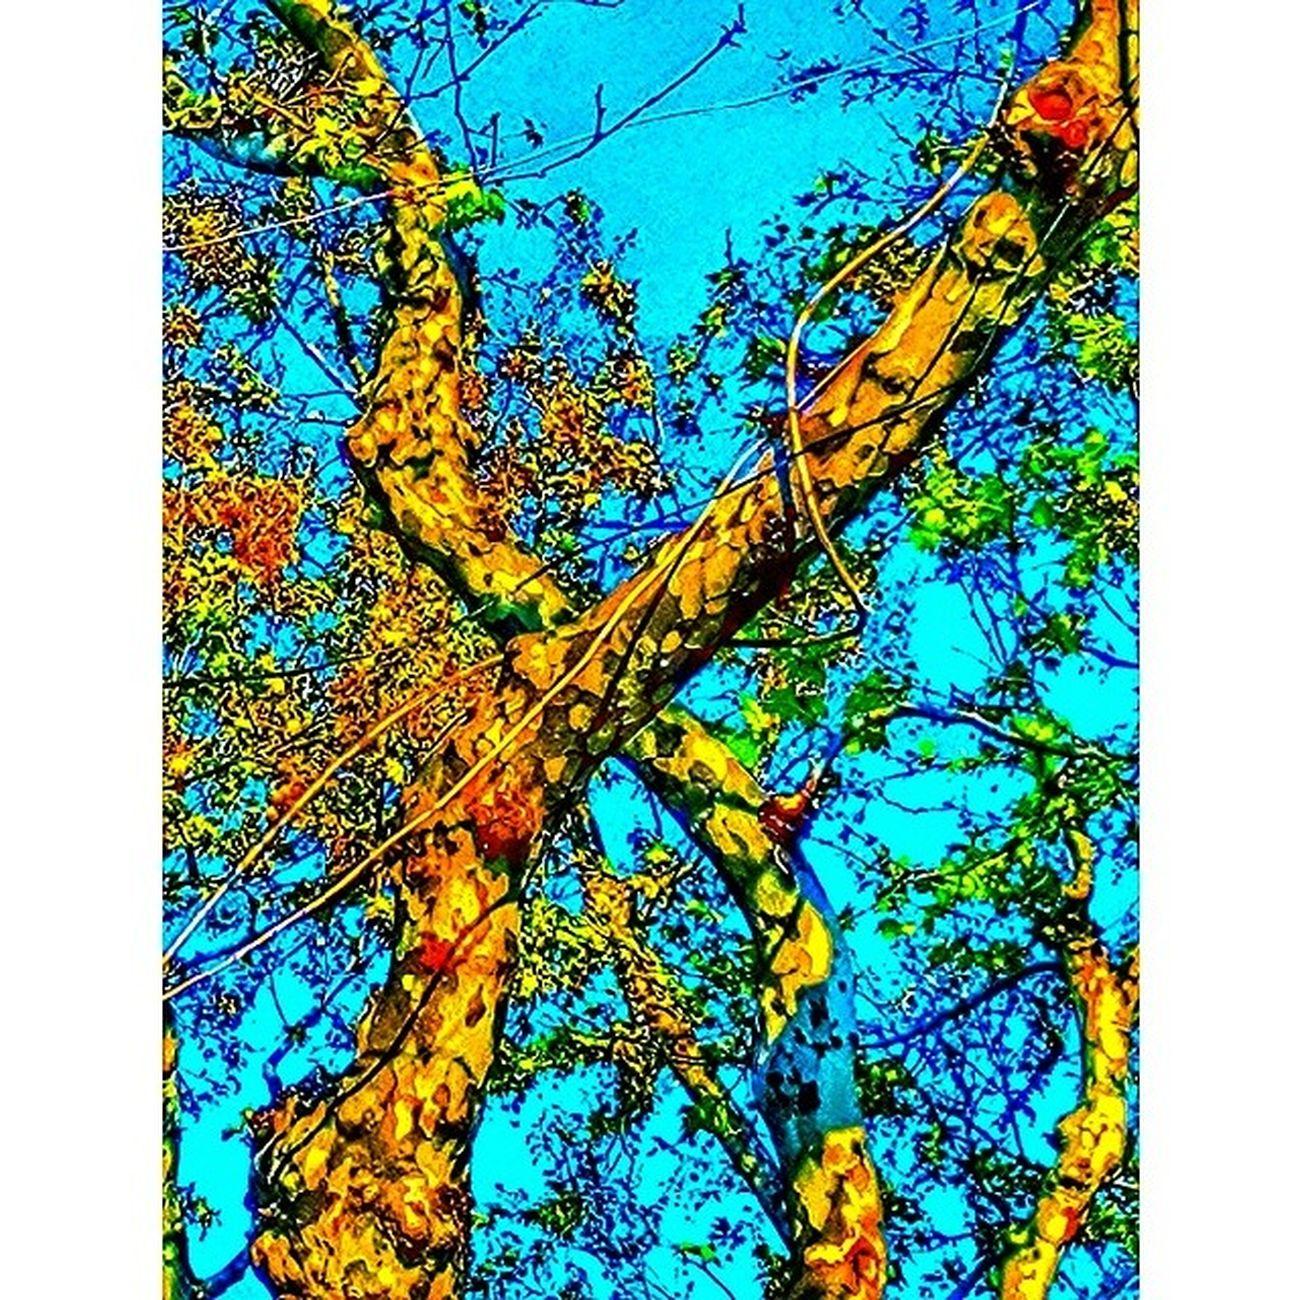 Improvisation Color Colour Turkuaz çınar tree sky life